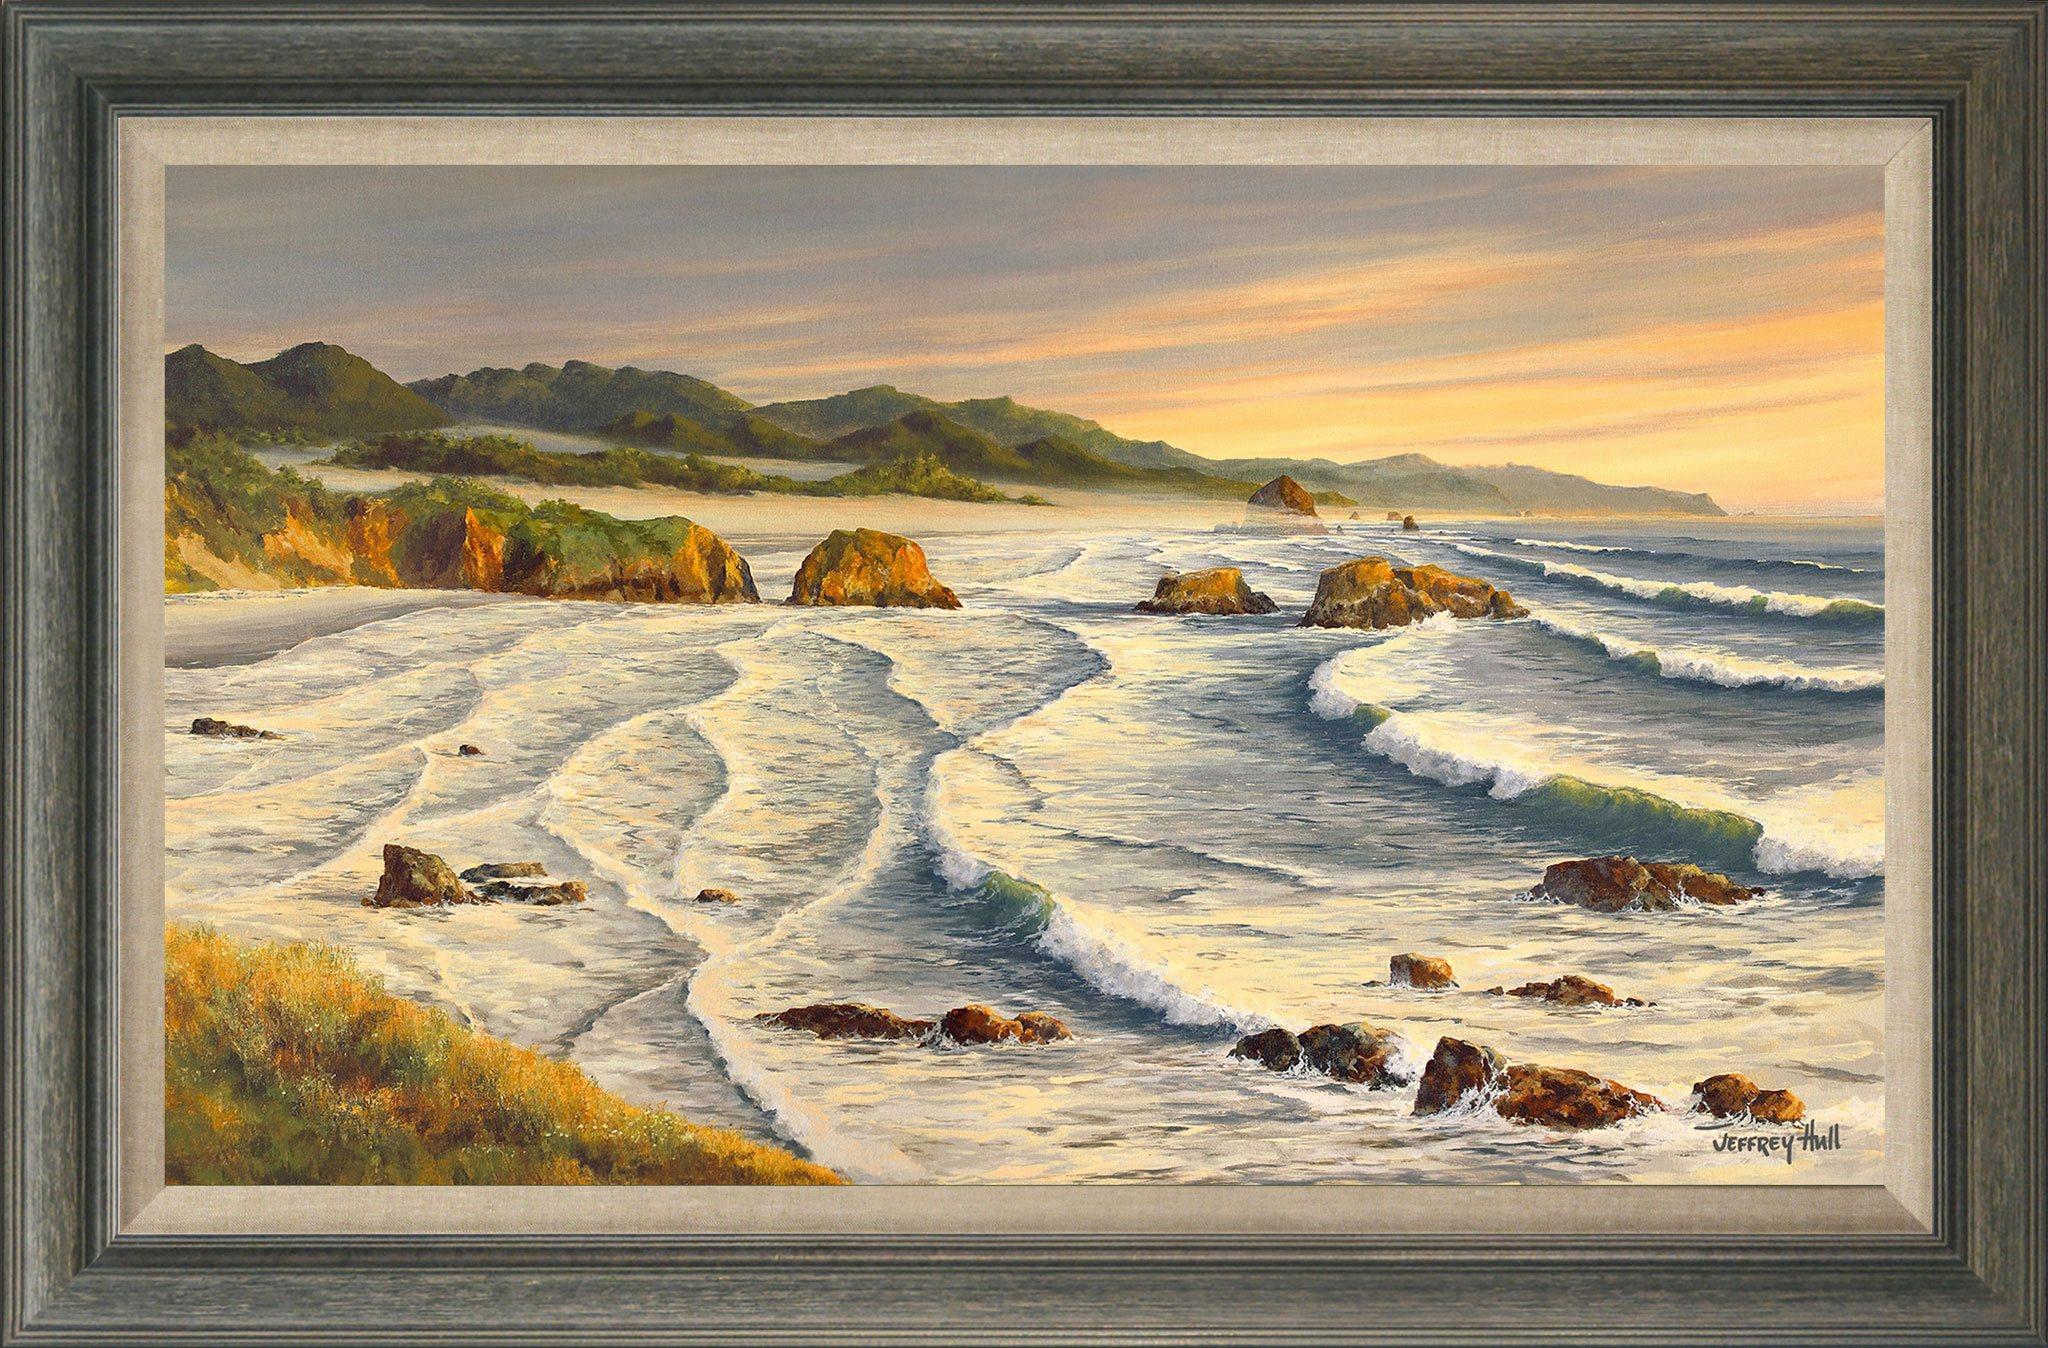 Golden-Evening-OpenEd-Cascade-Natural-Liner-4-Website-2021